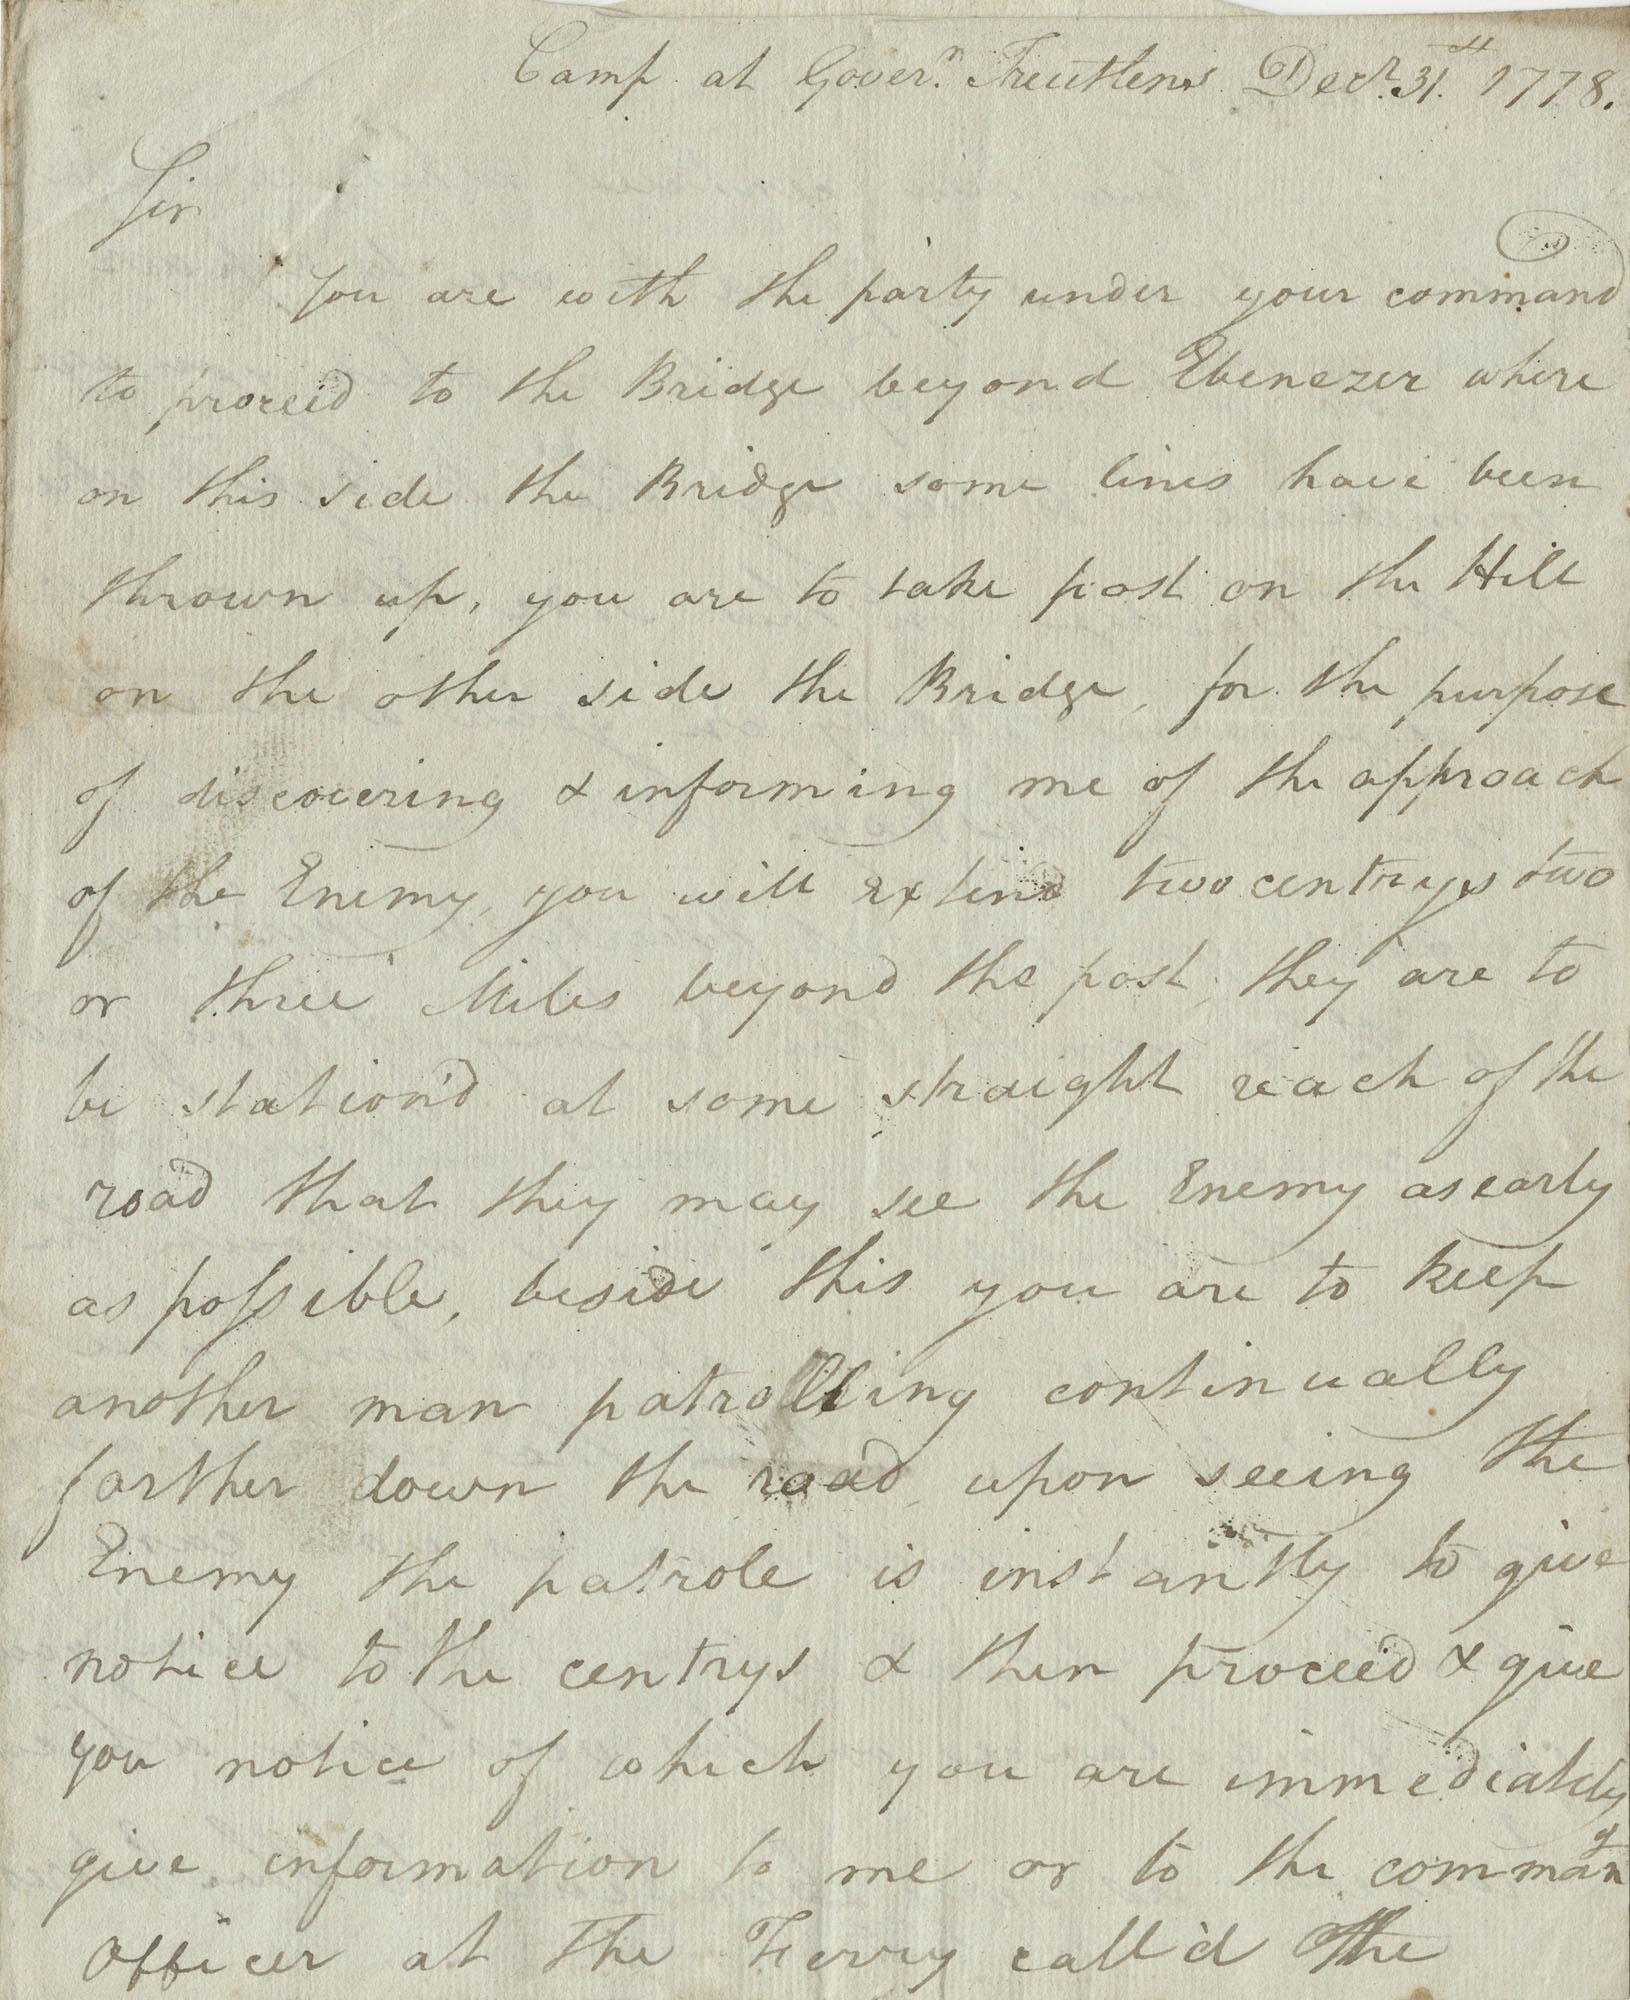 Letter written by Captain Joseph Warley, December 31, 1778